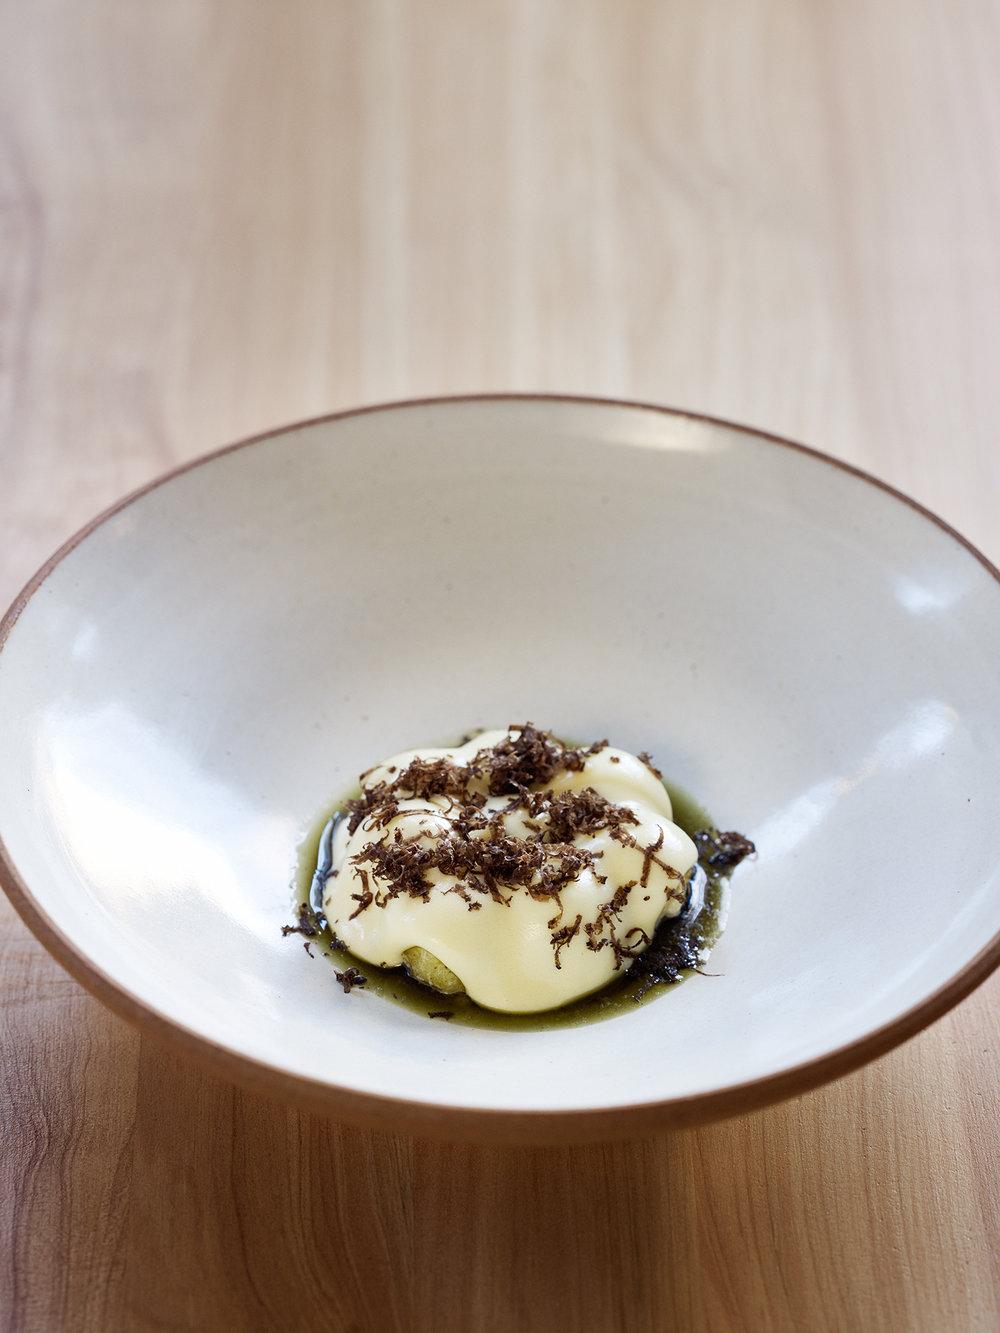 Potatoes, seaweed & truffle | Aaron Mclean